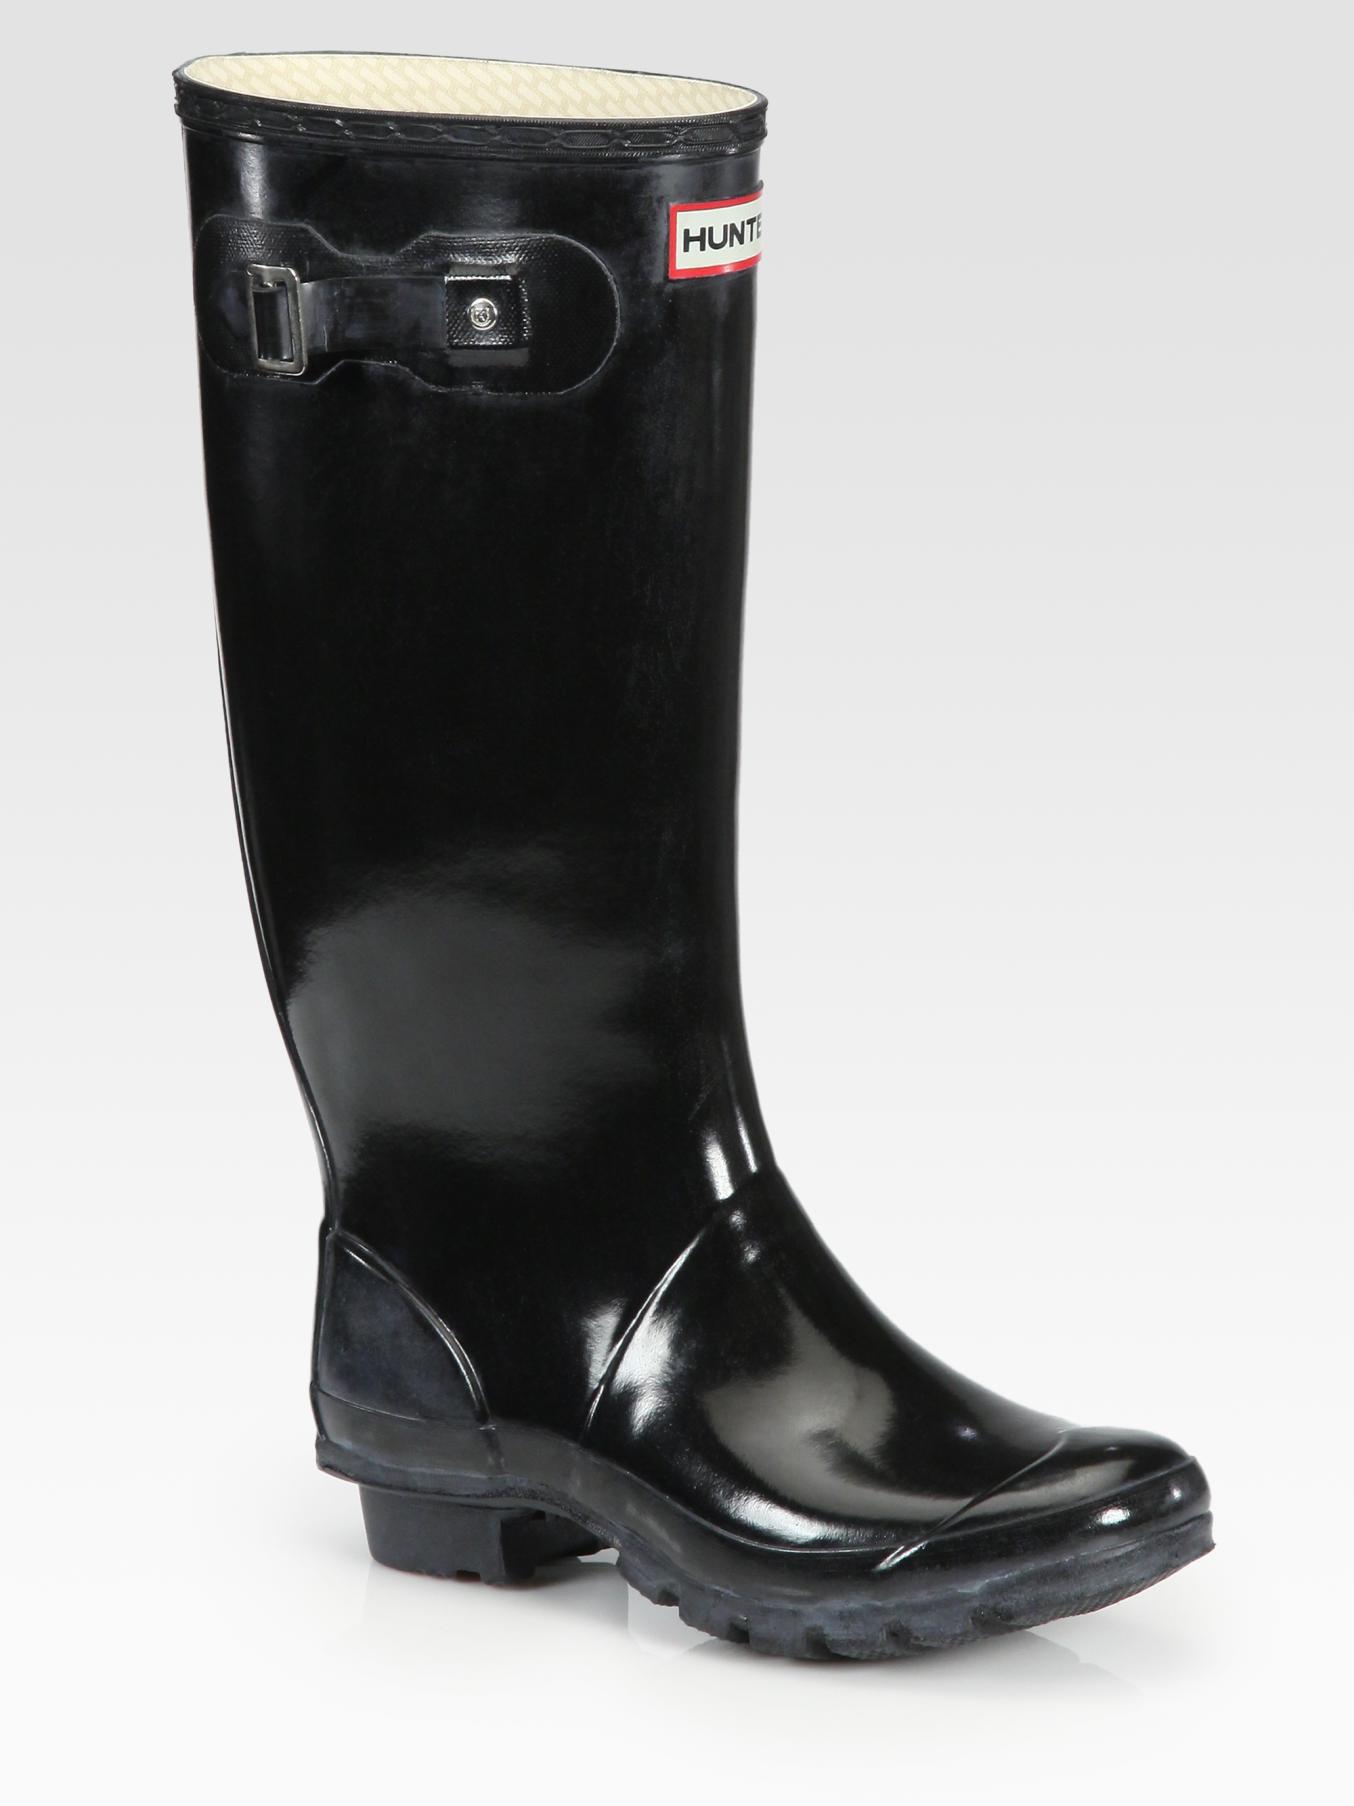 Hunter Huntress Wide-Calf Rain Boots In Black - Lyst